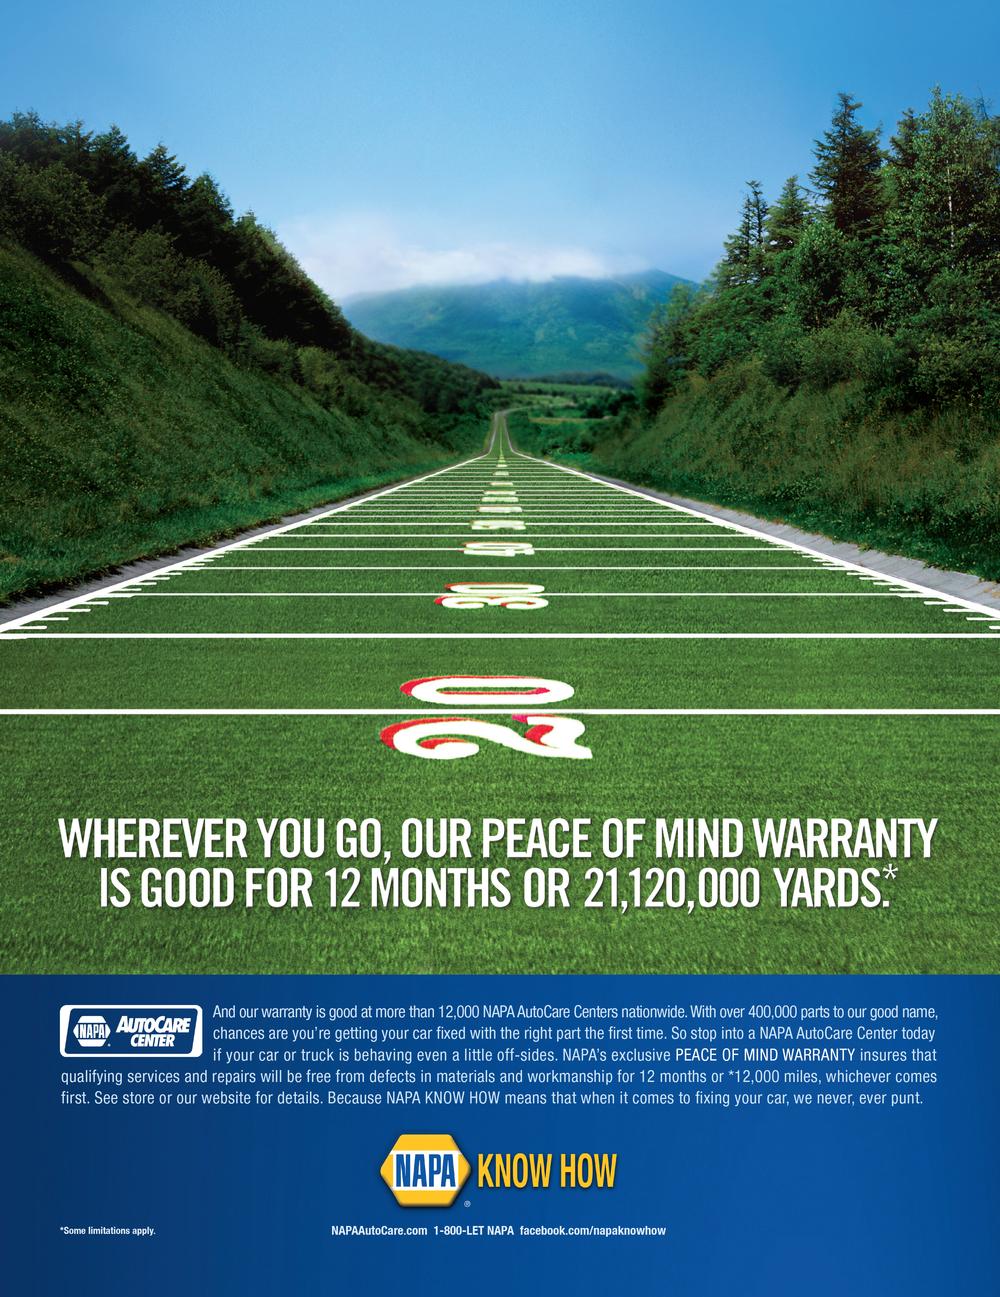 T0-8106-7_NAPA College Football Print Ad-cropped.jpg